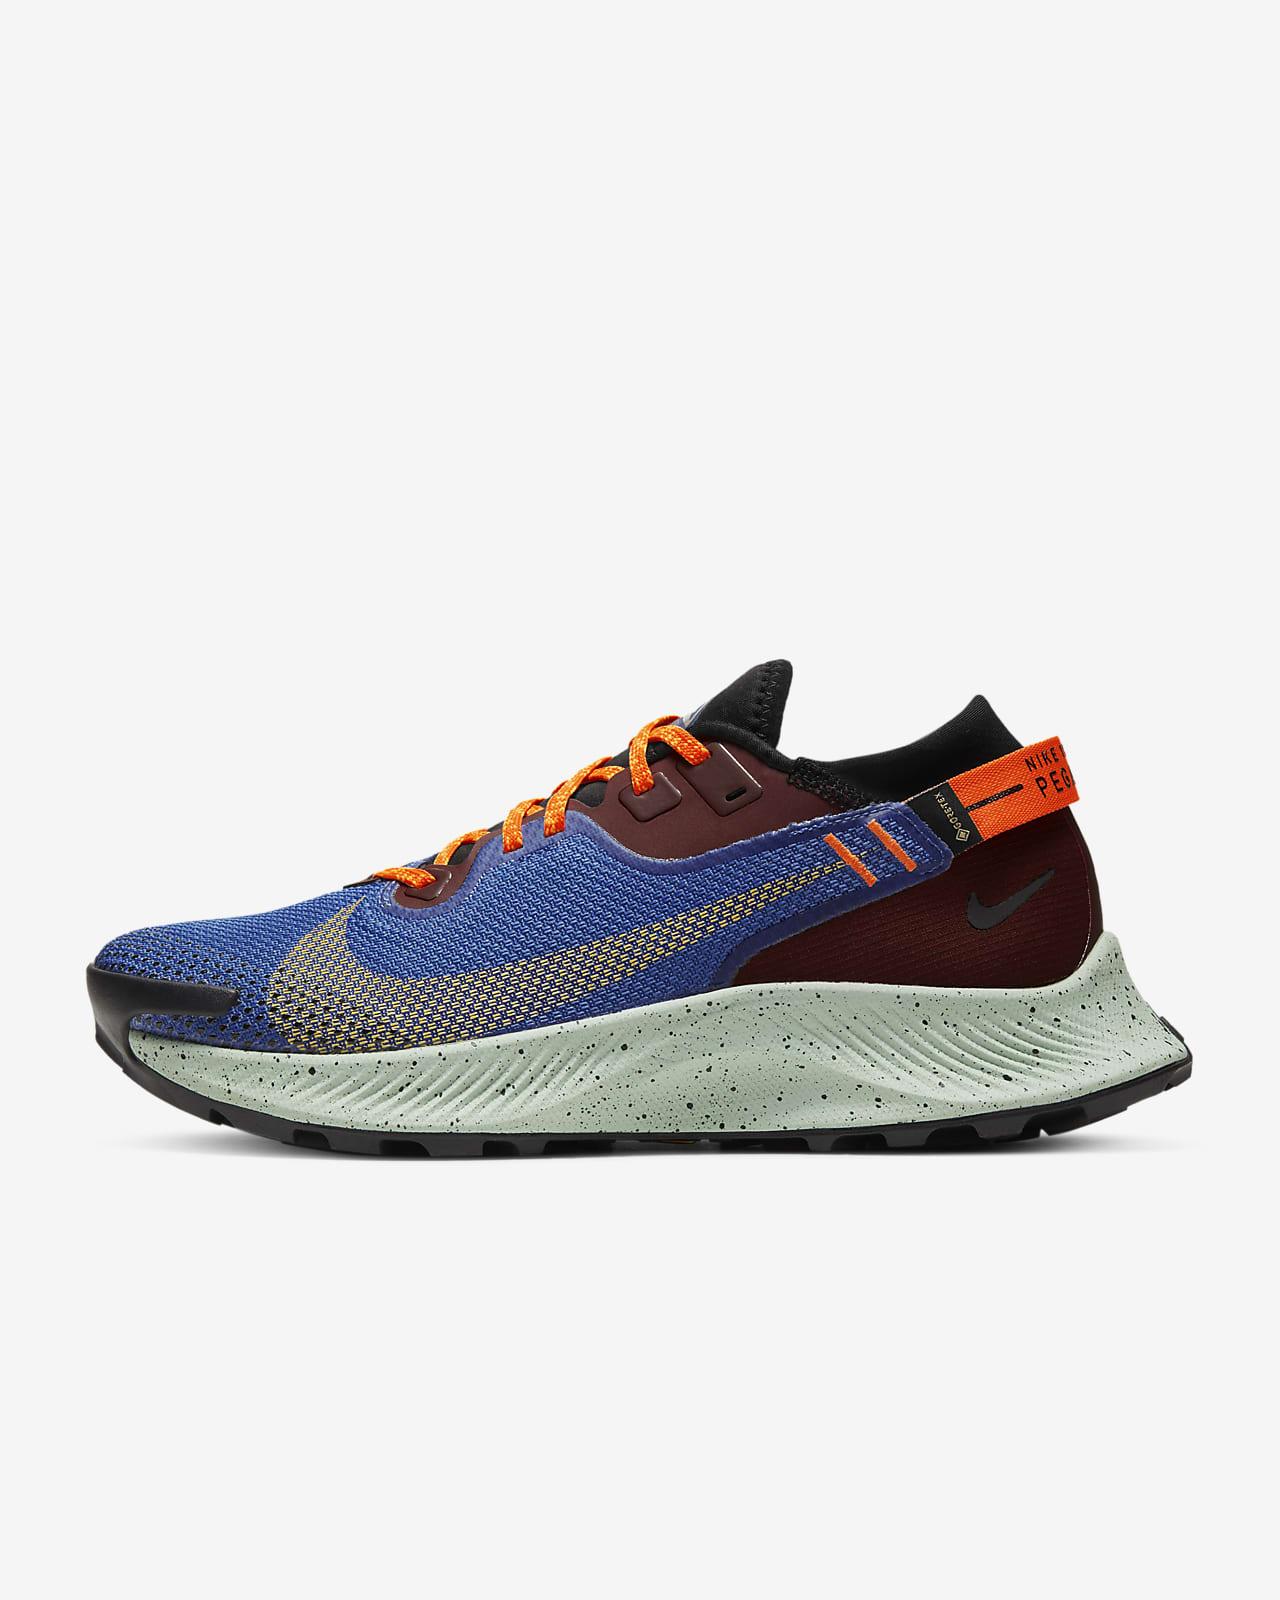 Nike Pegasus Trail 2 GORE-TEX Women's Trail Running Shoes